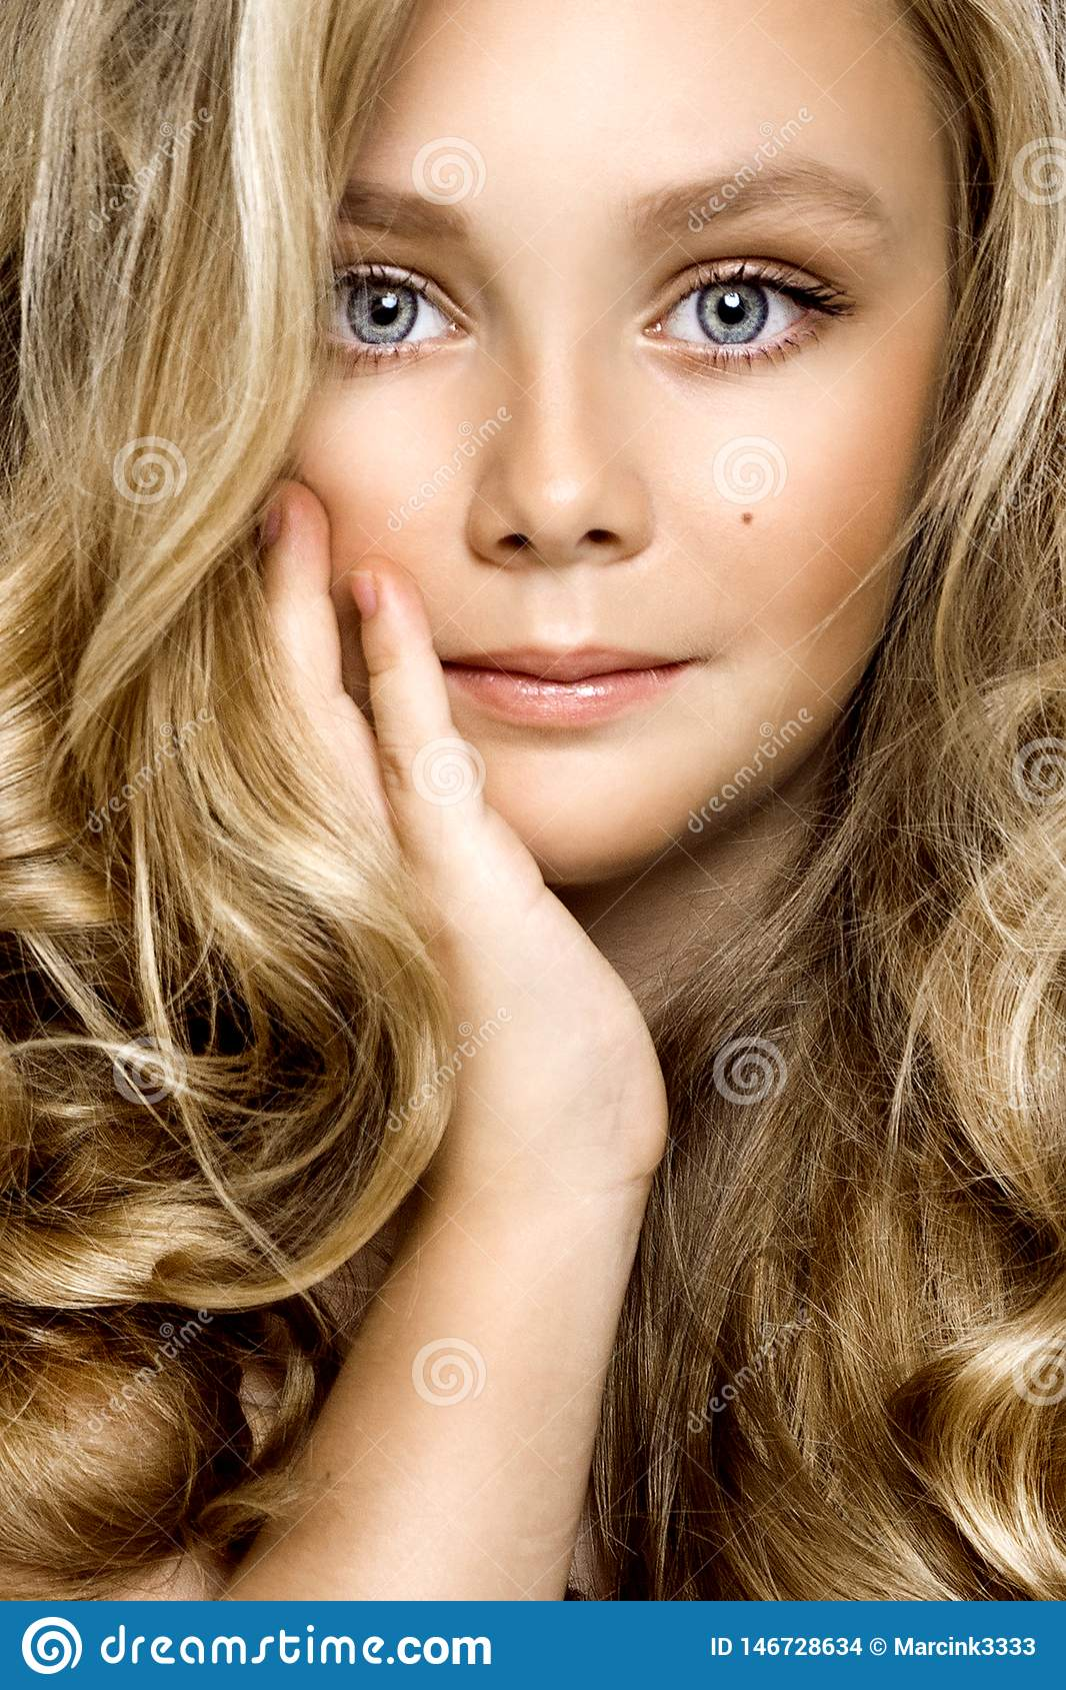 Healthy skin young blonde girl white skin no makeup beauty female model closeup - Obraz